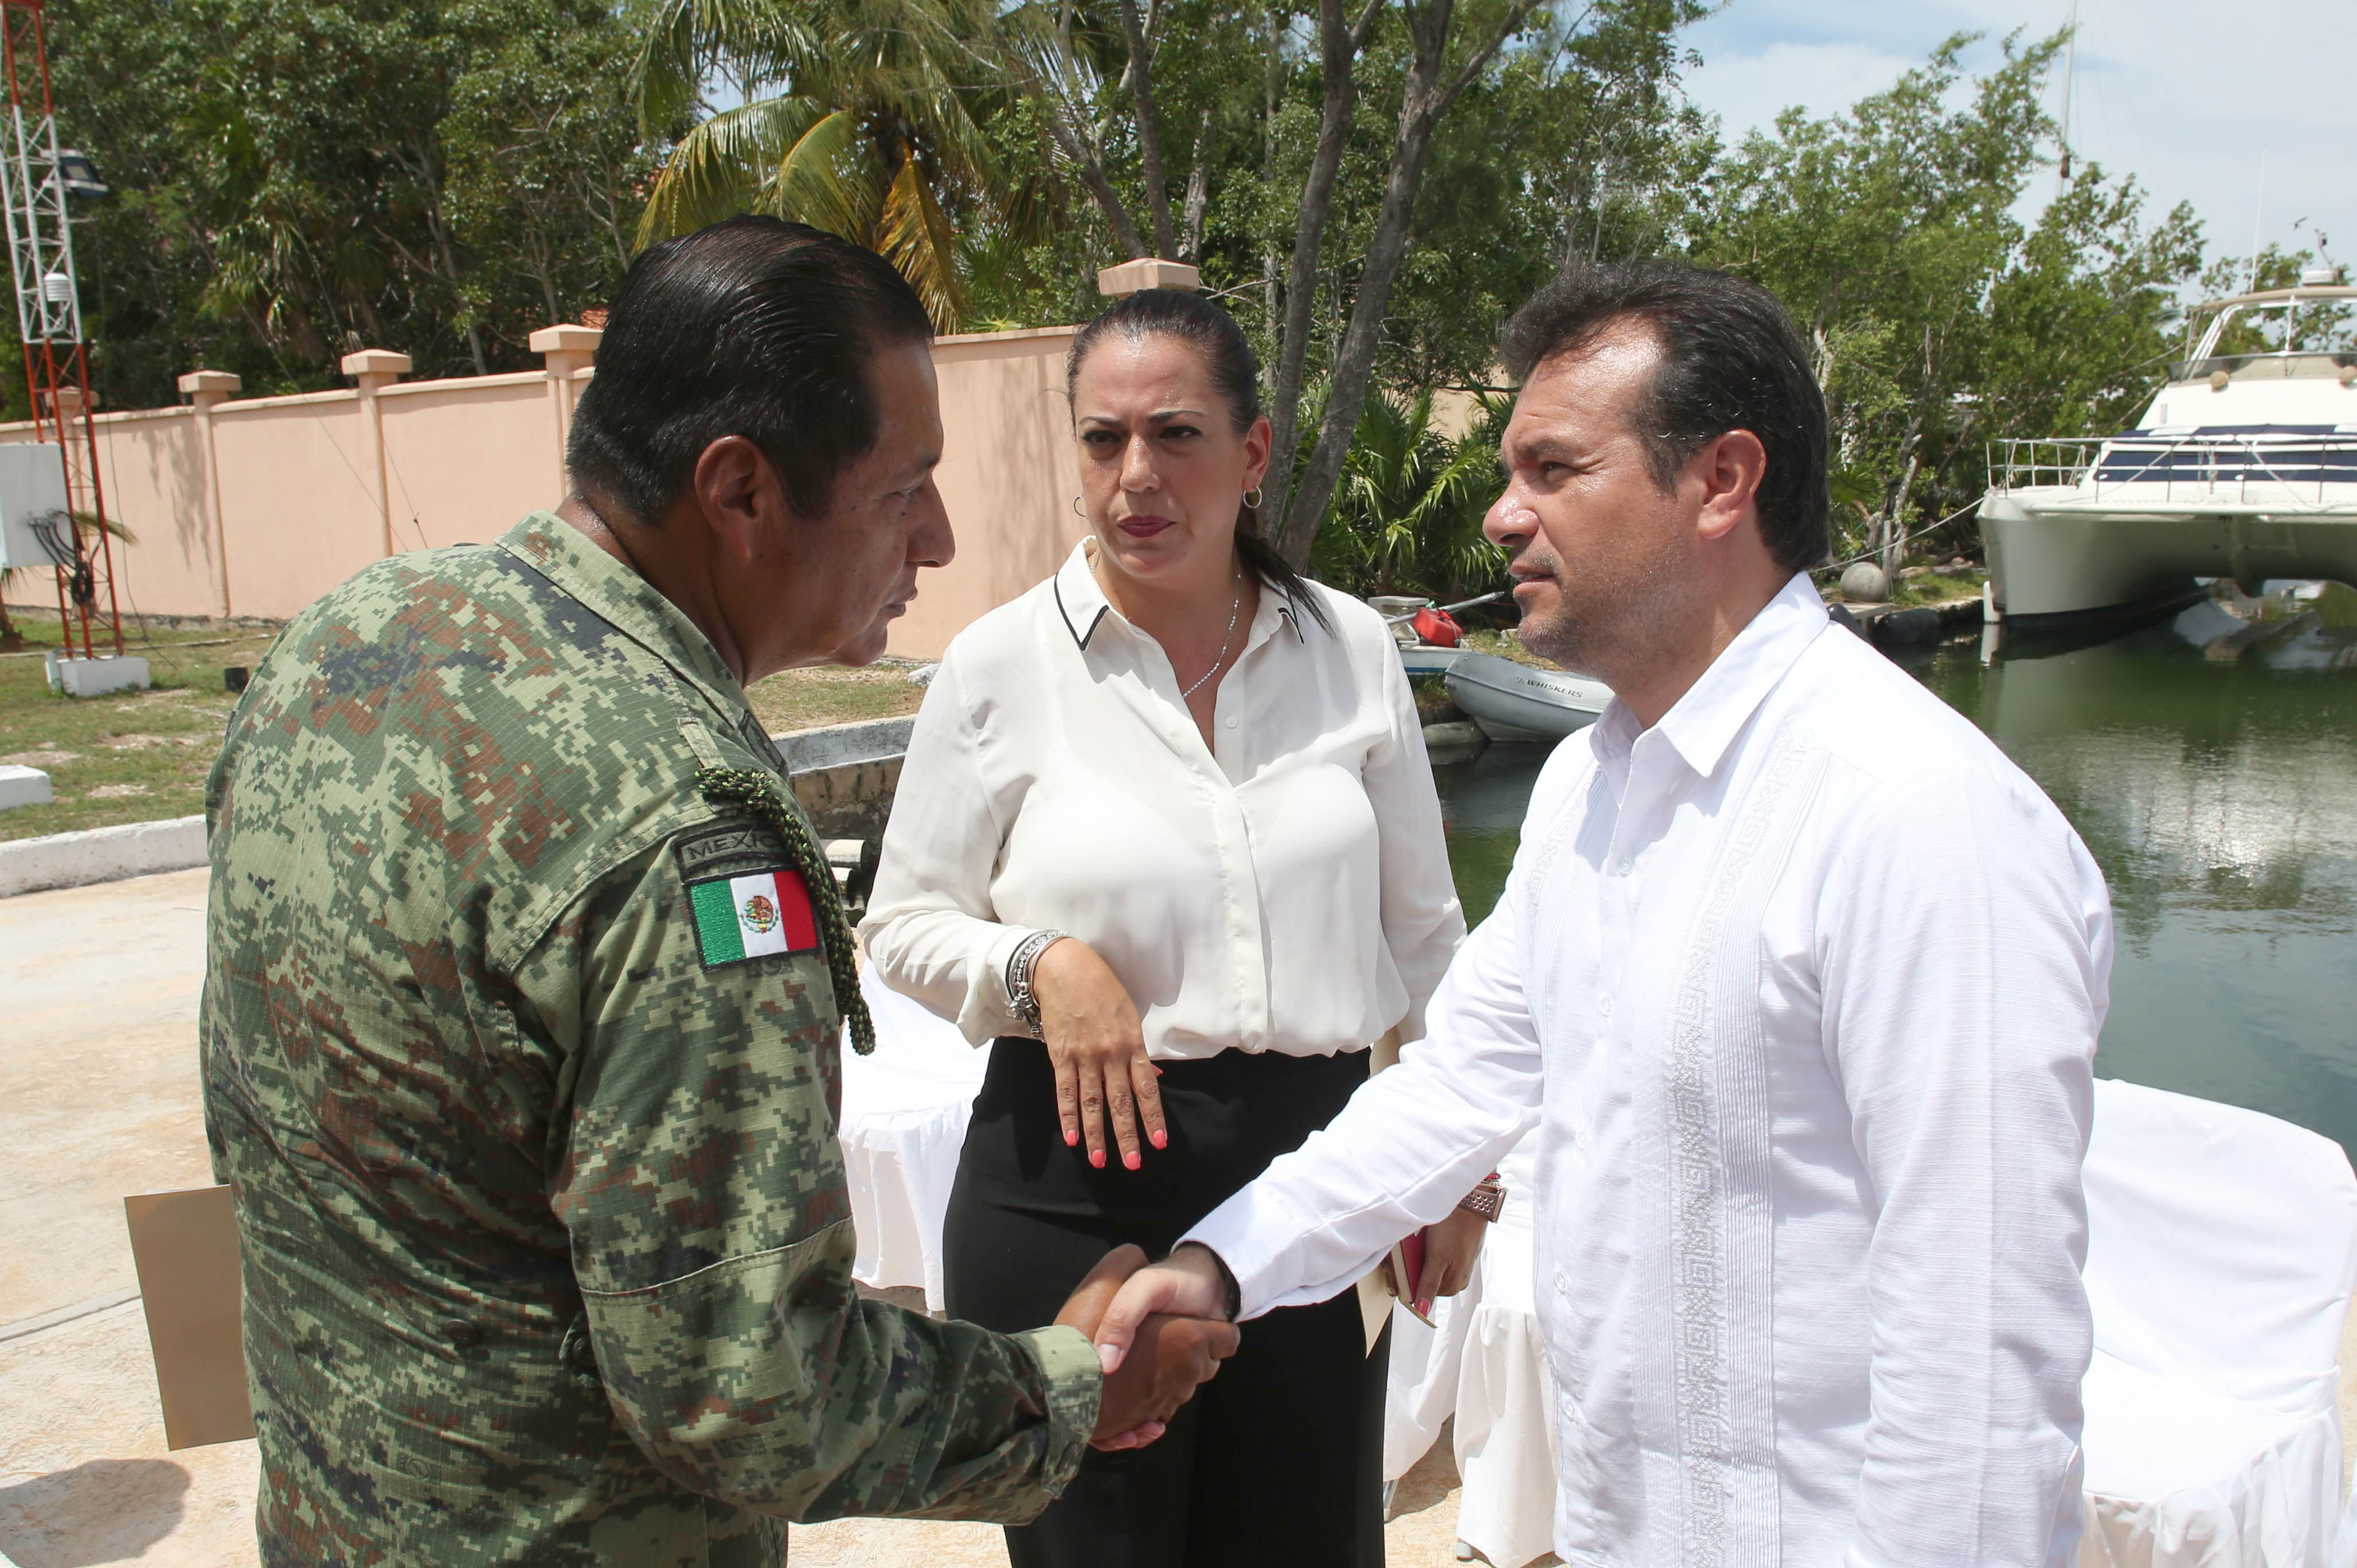 Cozumel se confirma como el municipio más seguro de Quintana Roo: Pedro Joaquín